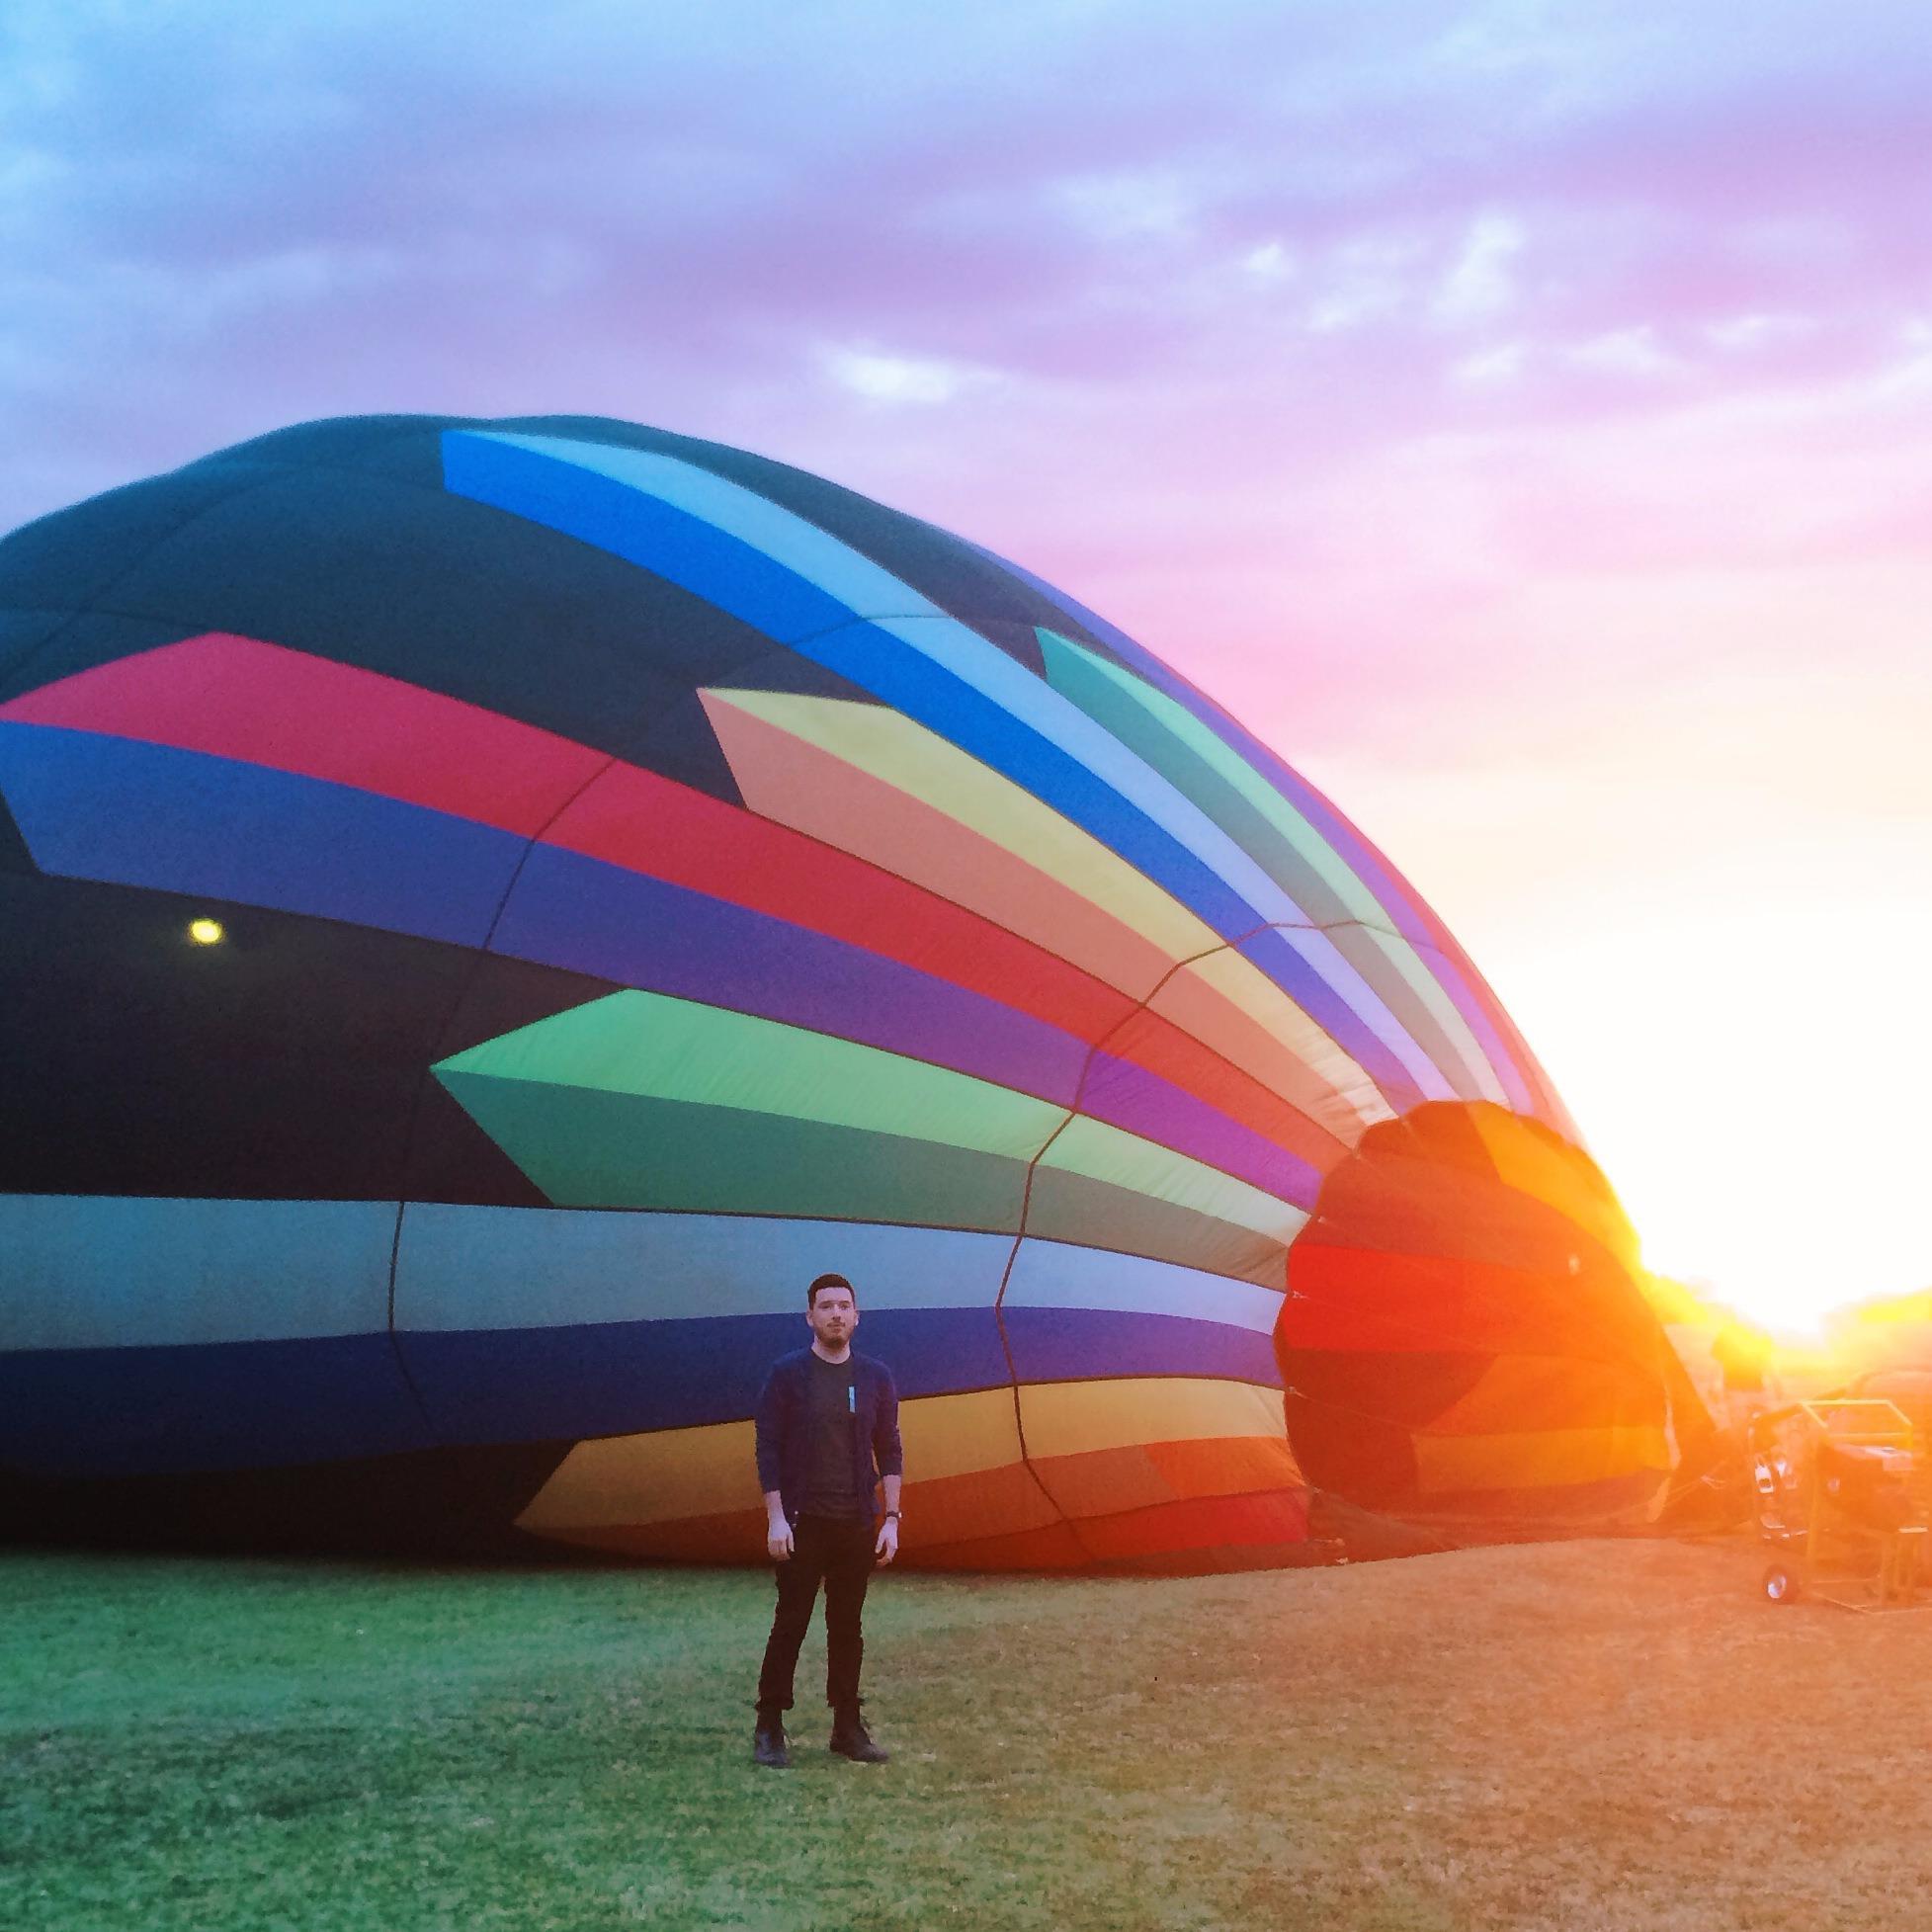 Glendale Hot Air Balloon Rides - Aerogelic Ballooning